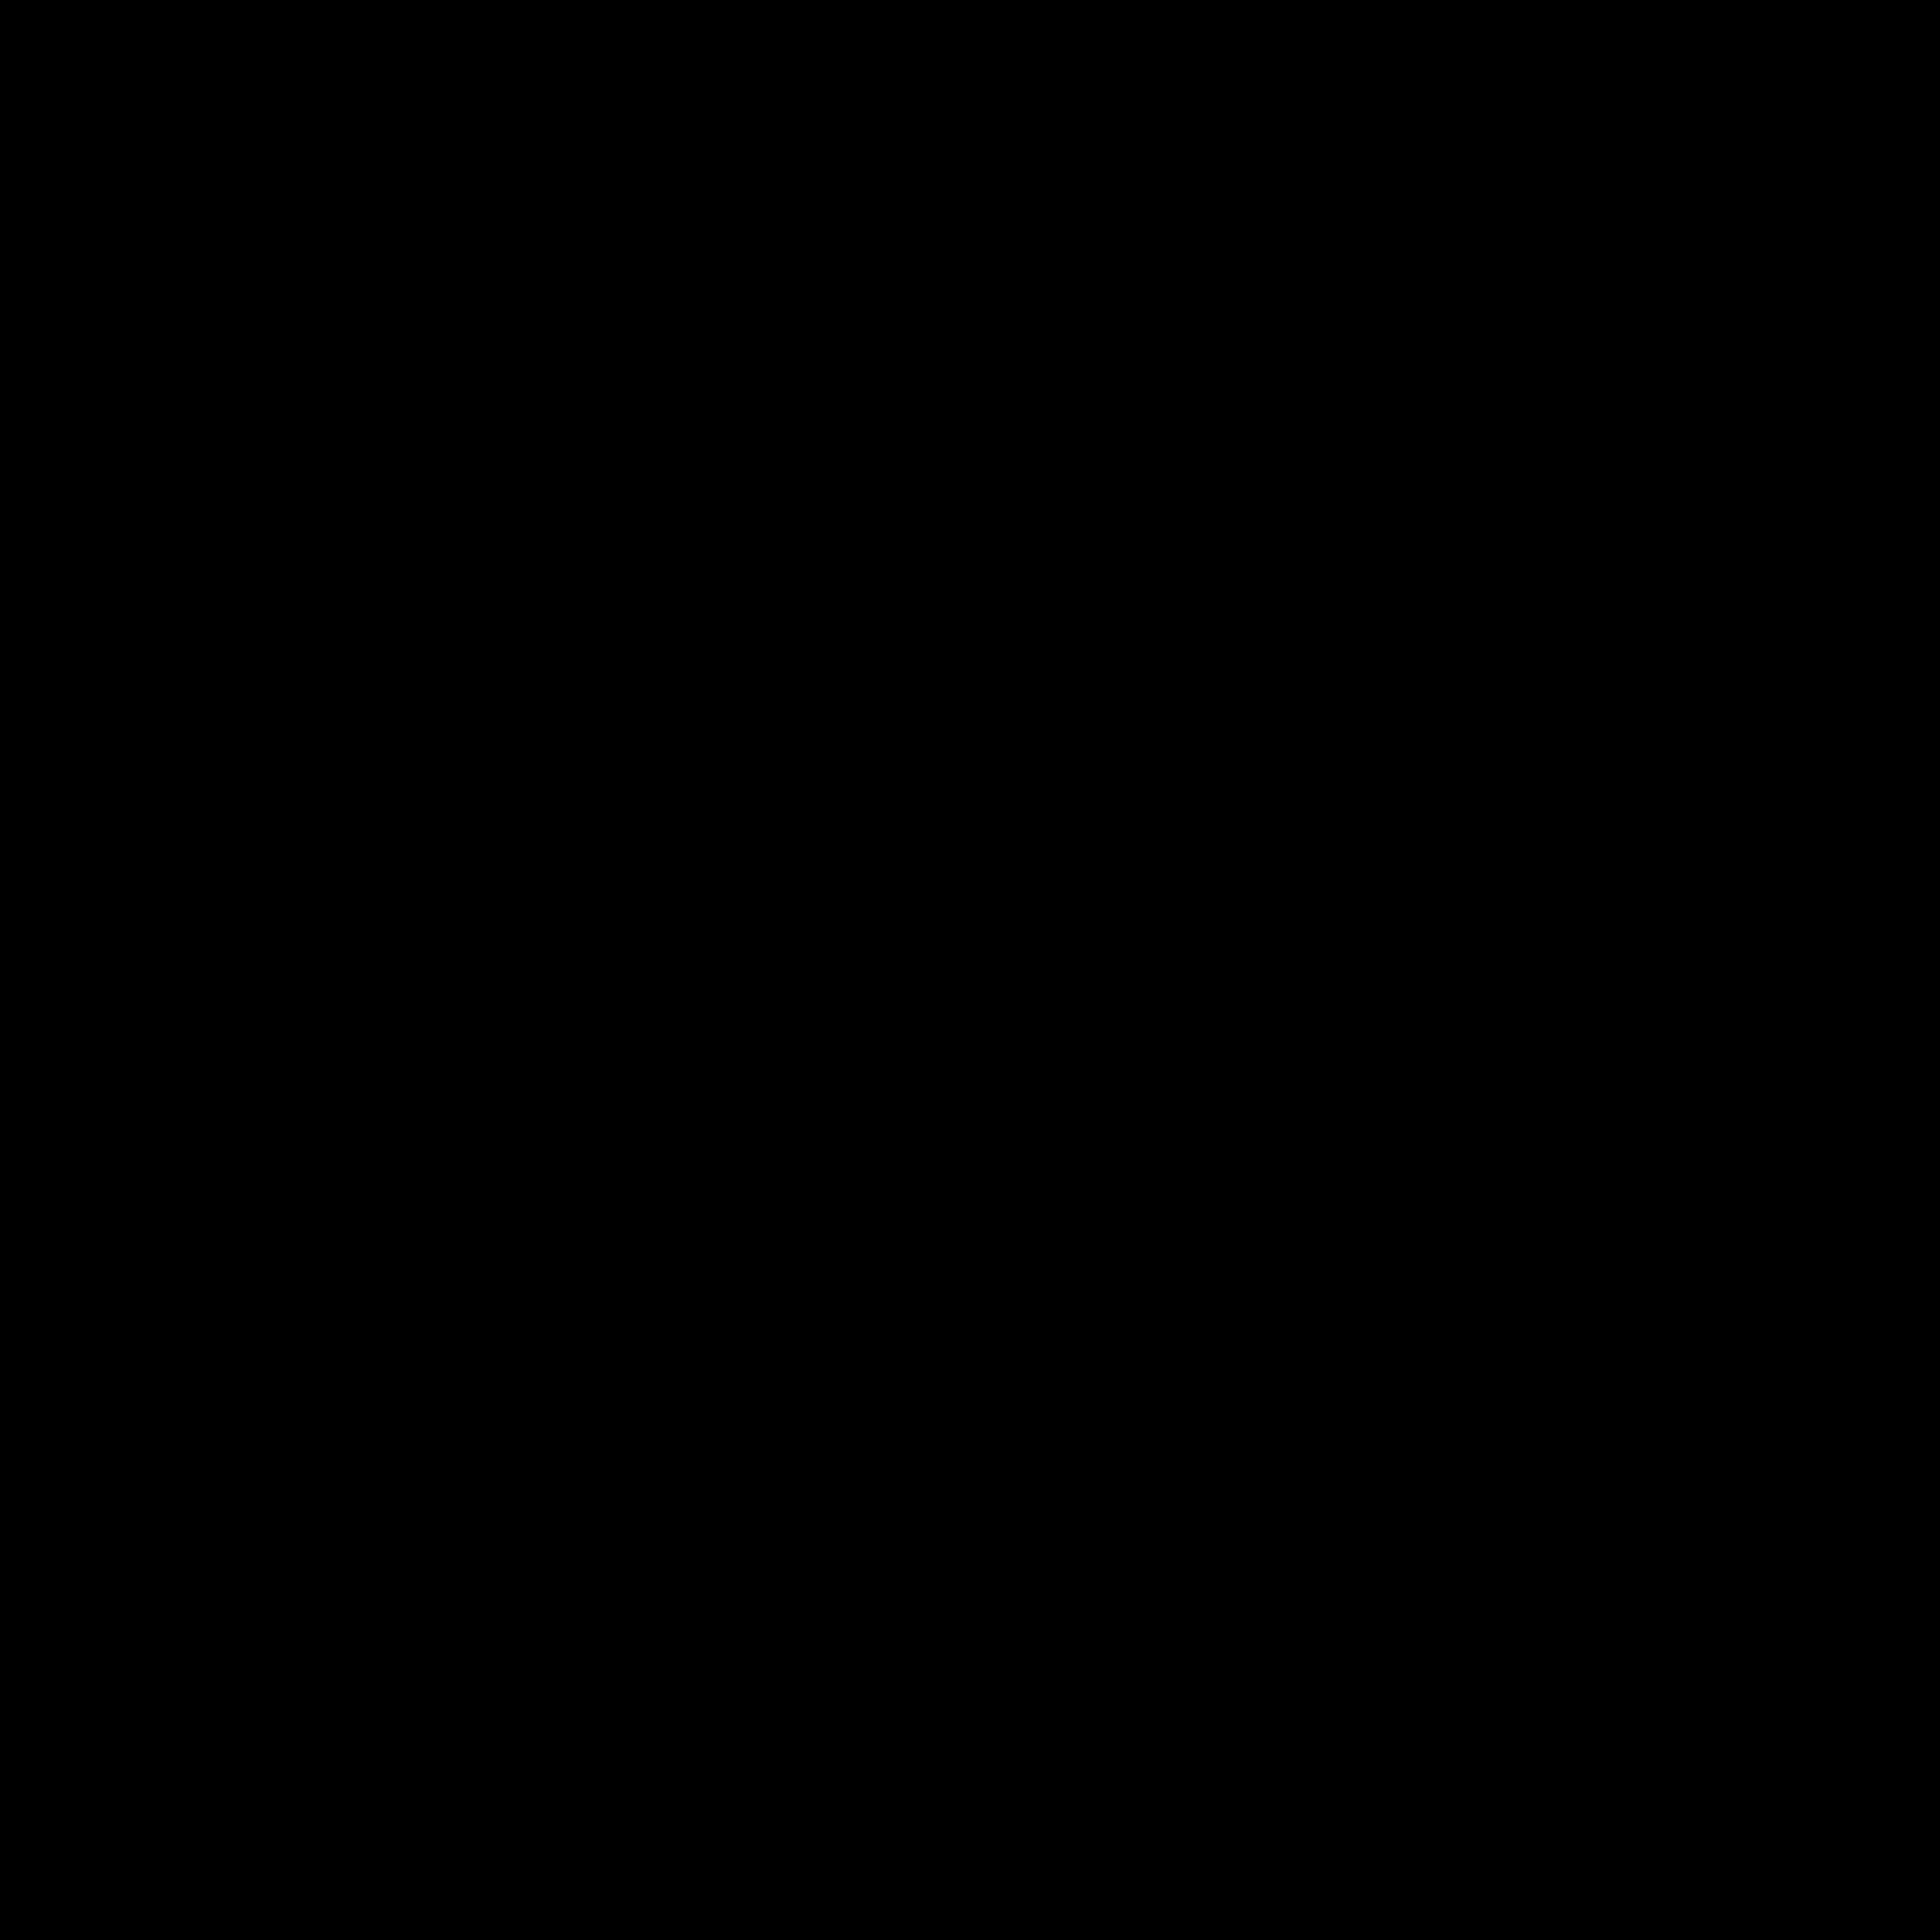 federal reserve logo fed 0 - Federal Reserve Logo - FED Logo